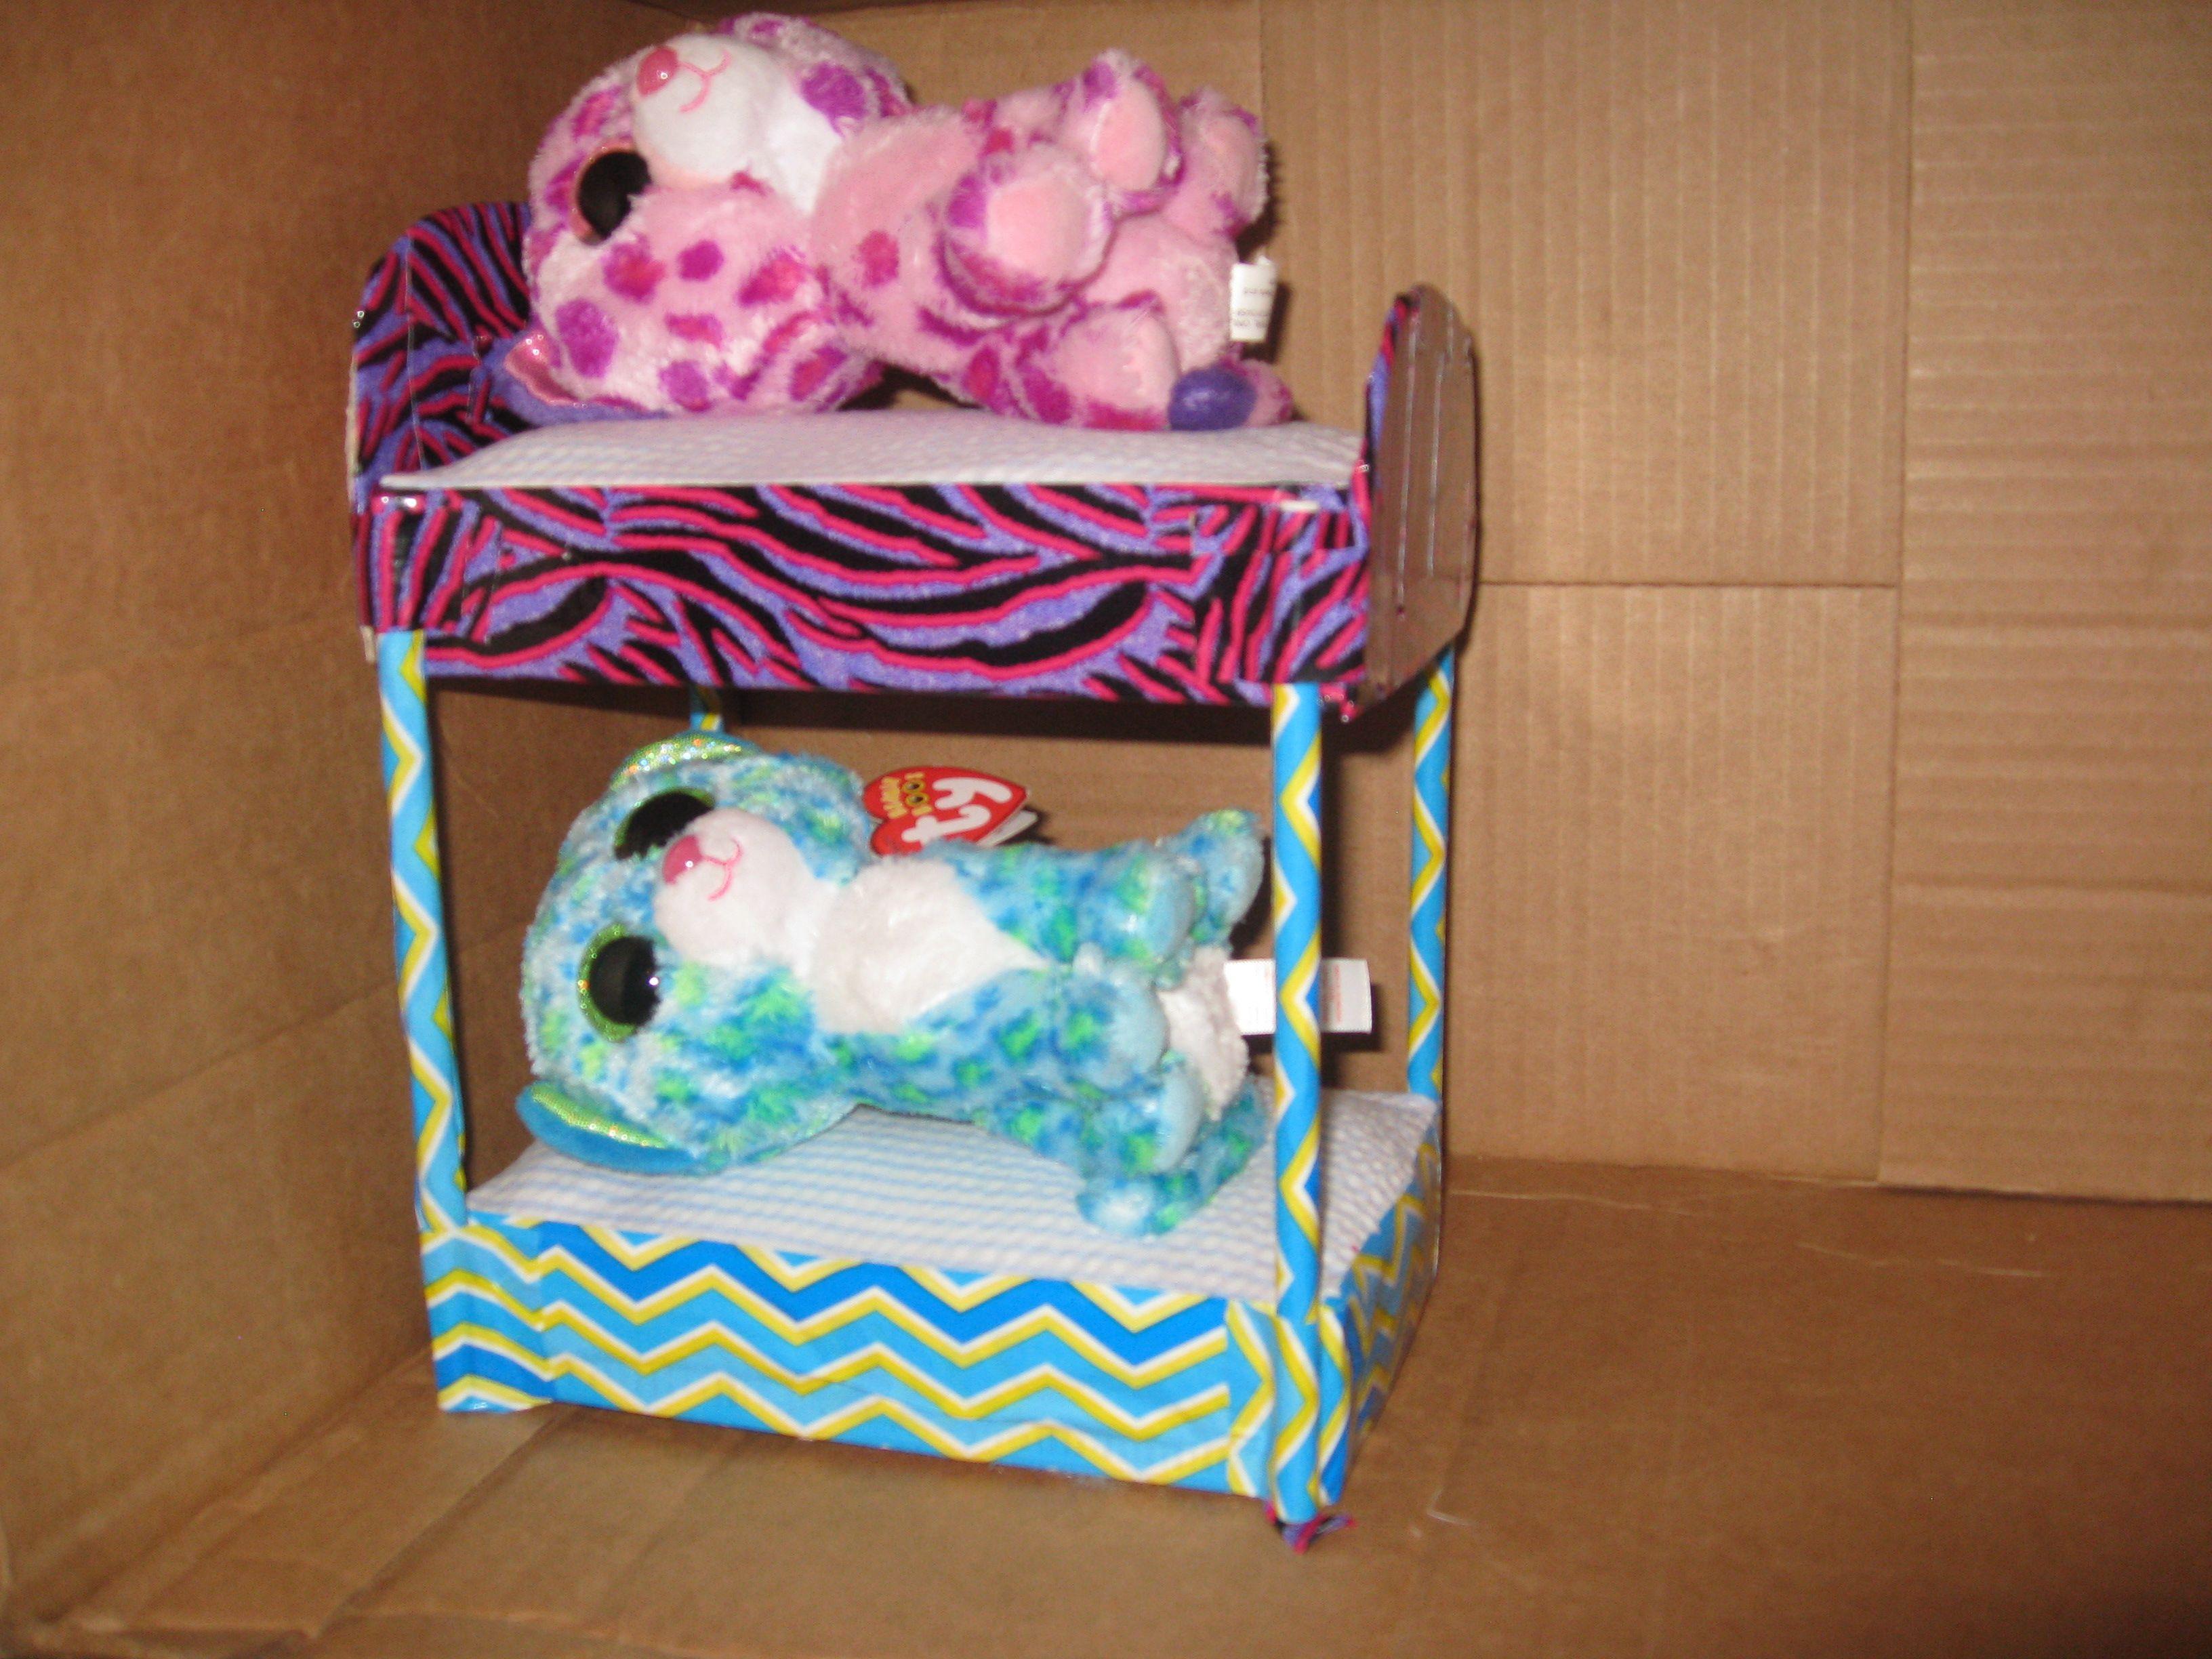 09859a5e3cb Beanie Boo bunk bed craft More